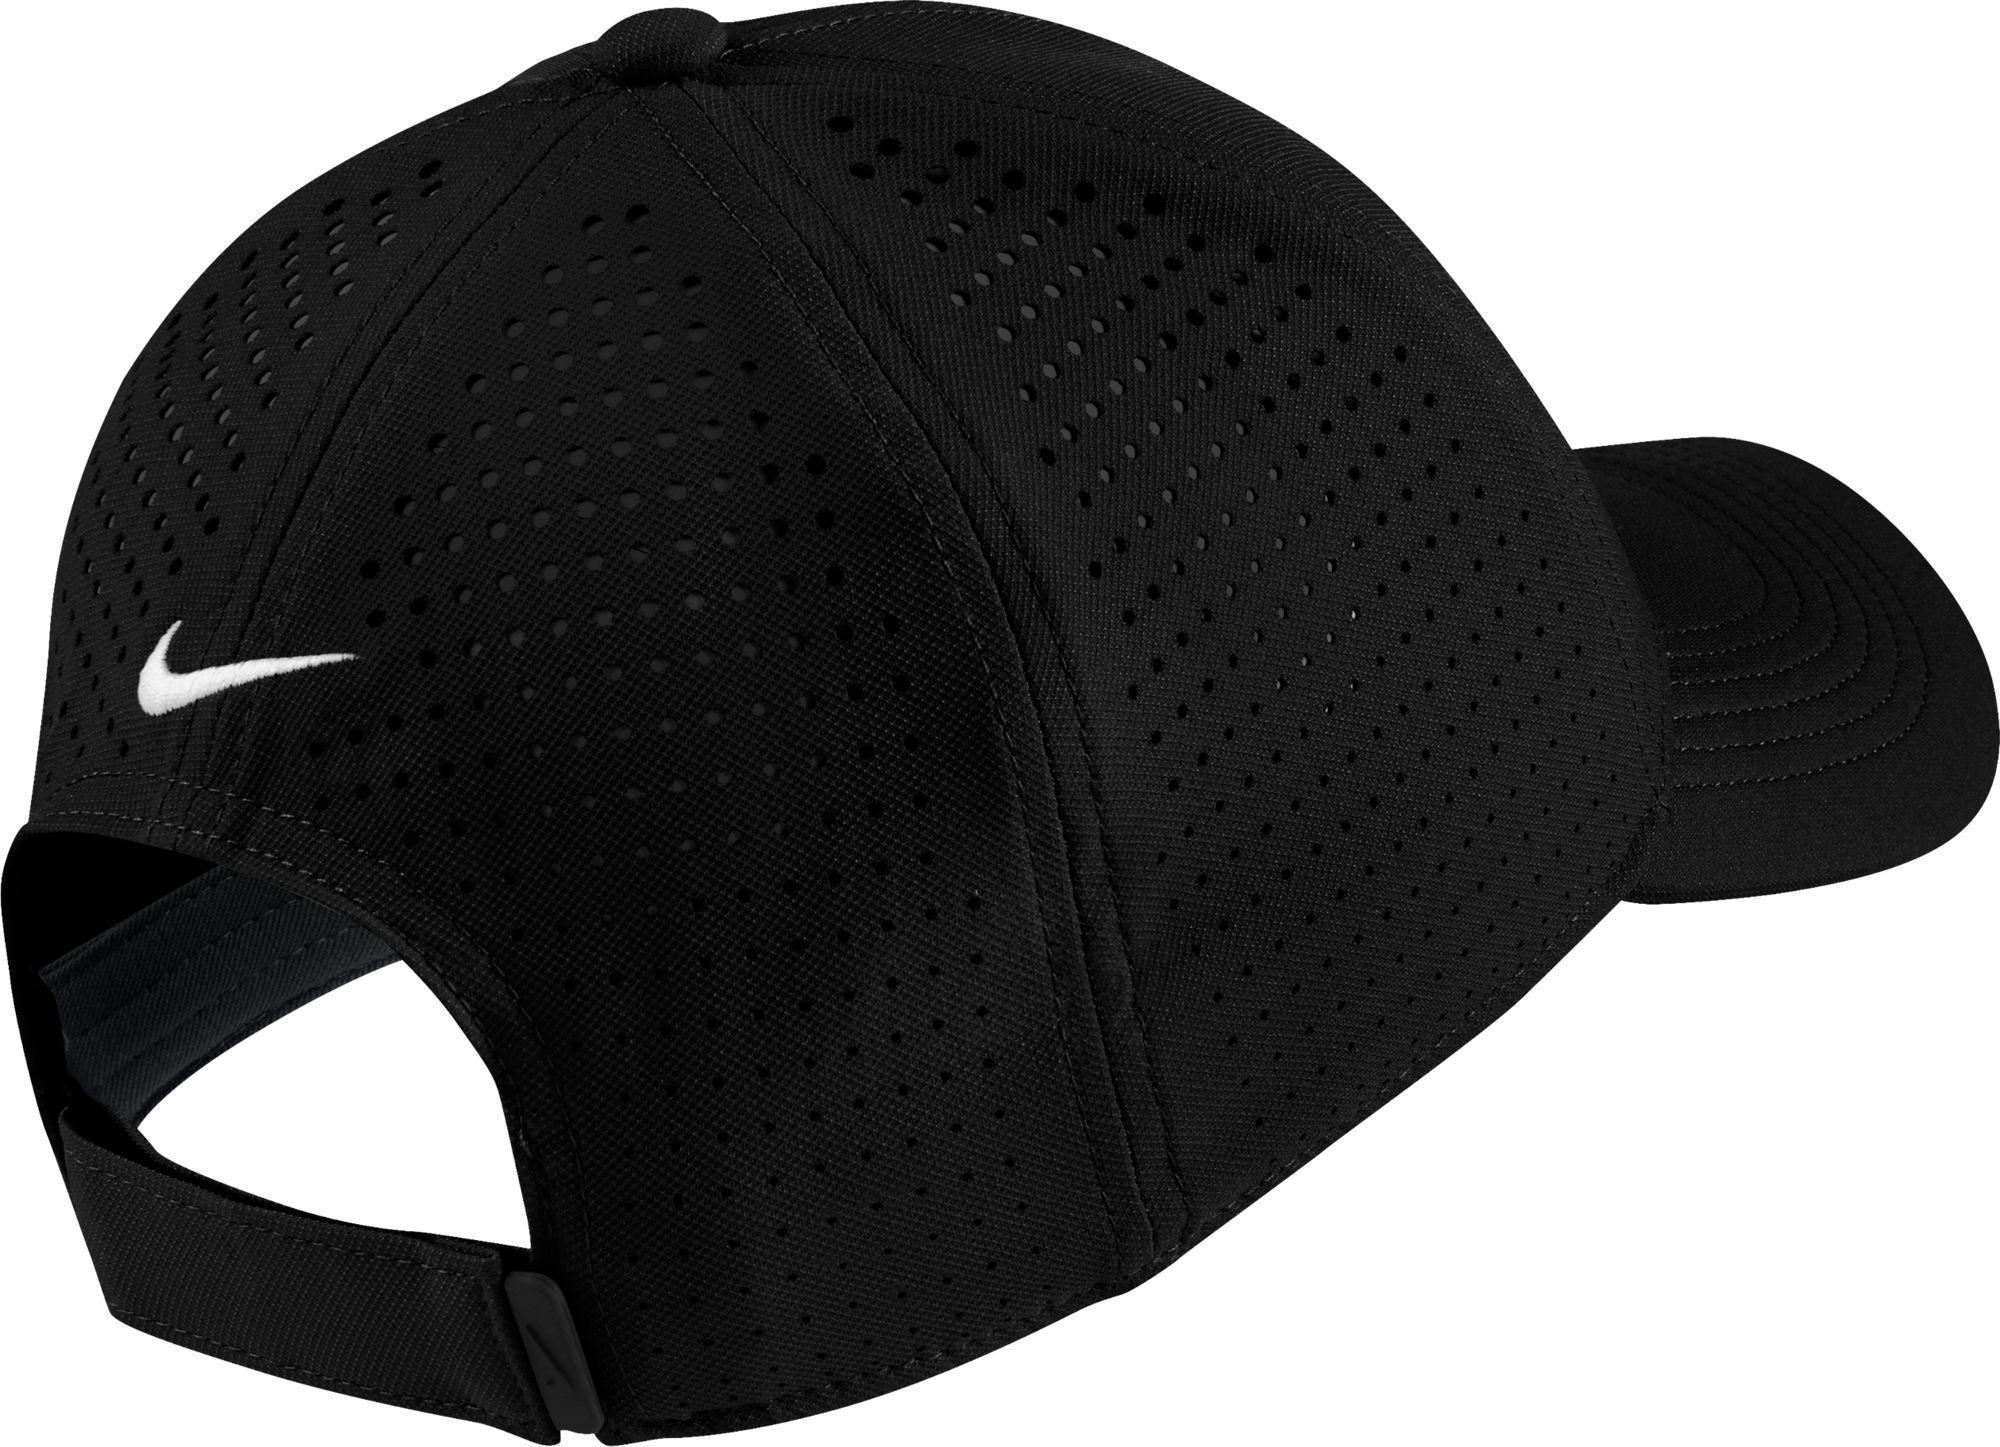 Nike - Black 2018 Aerobill Legacy91 Perforated Golf Hat for Men - Lyst.  View fullscreen 8641c1e4abd